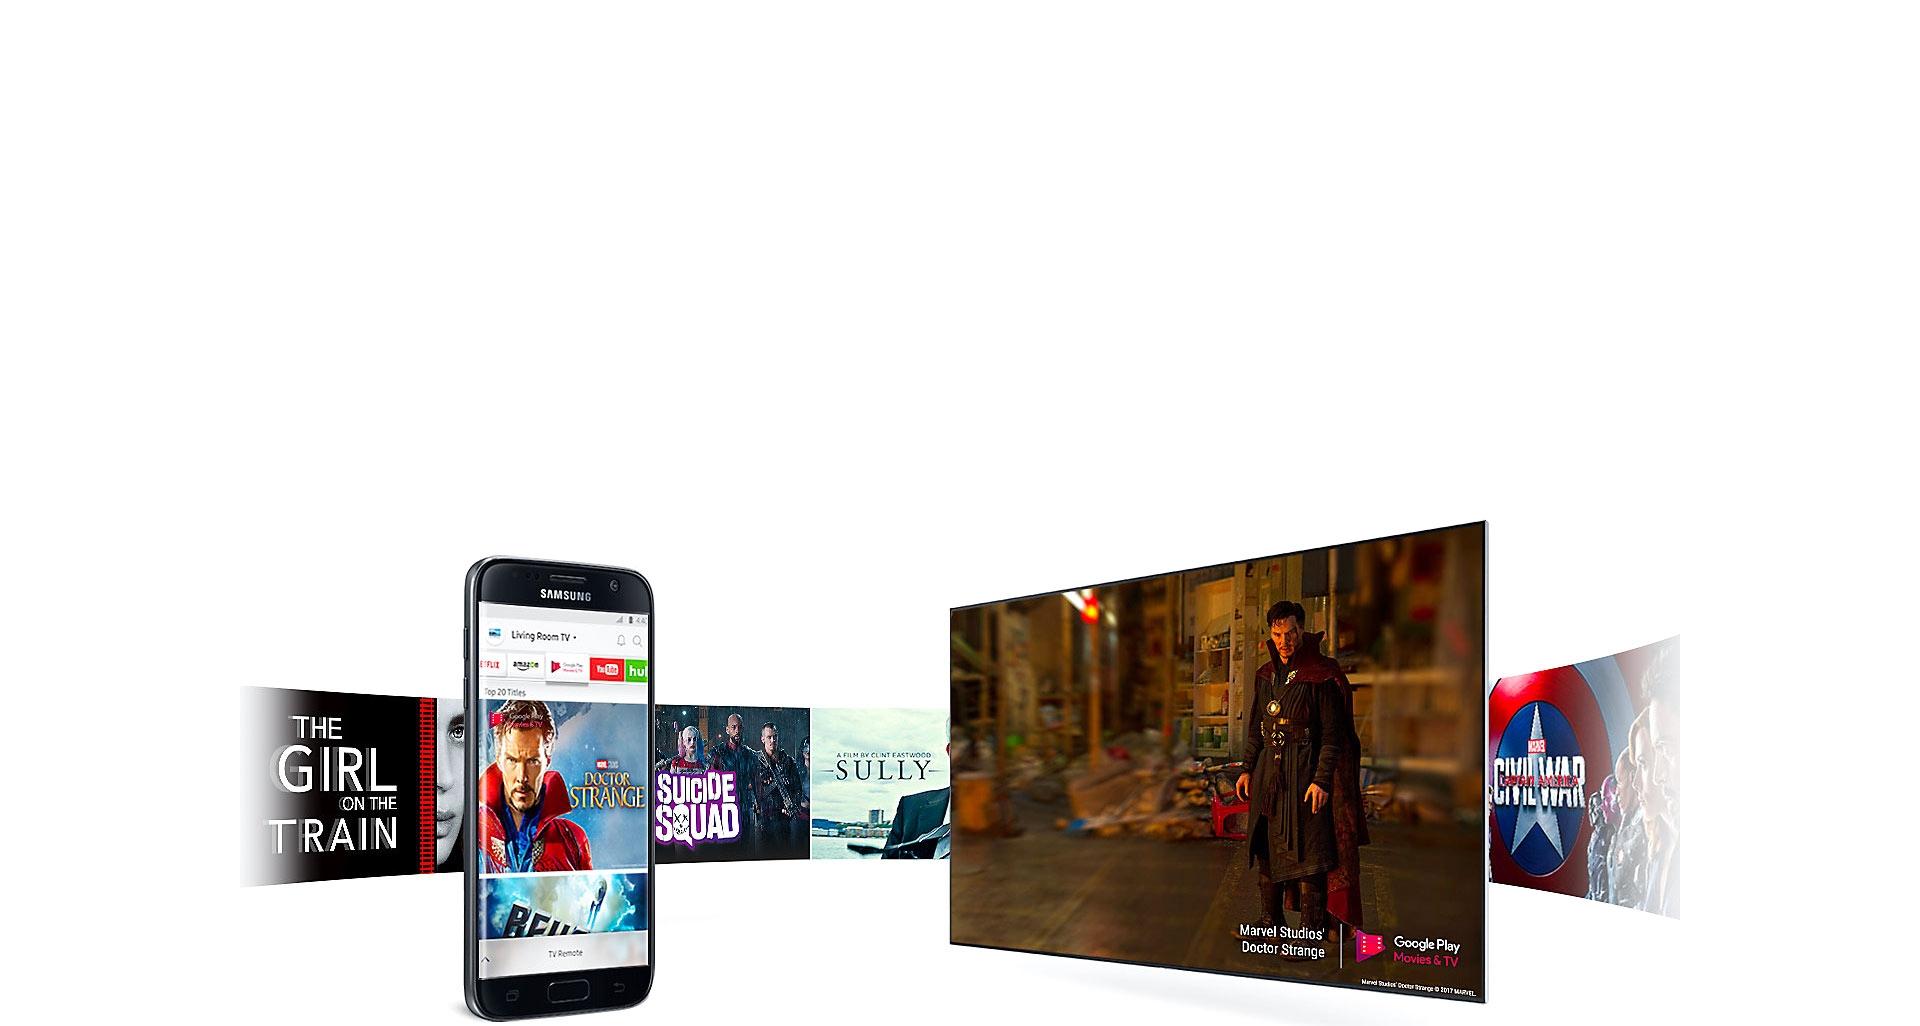 نمایش هوشمند ال ای دی Ultra HD سری 8